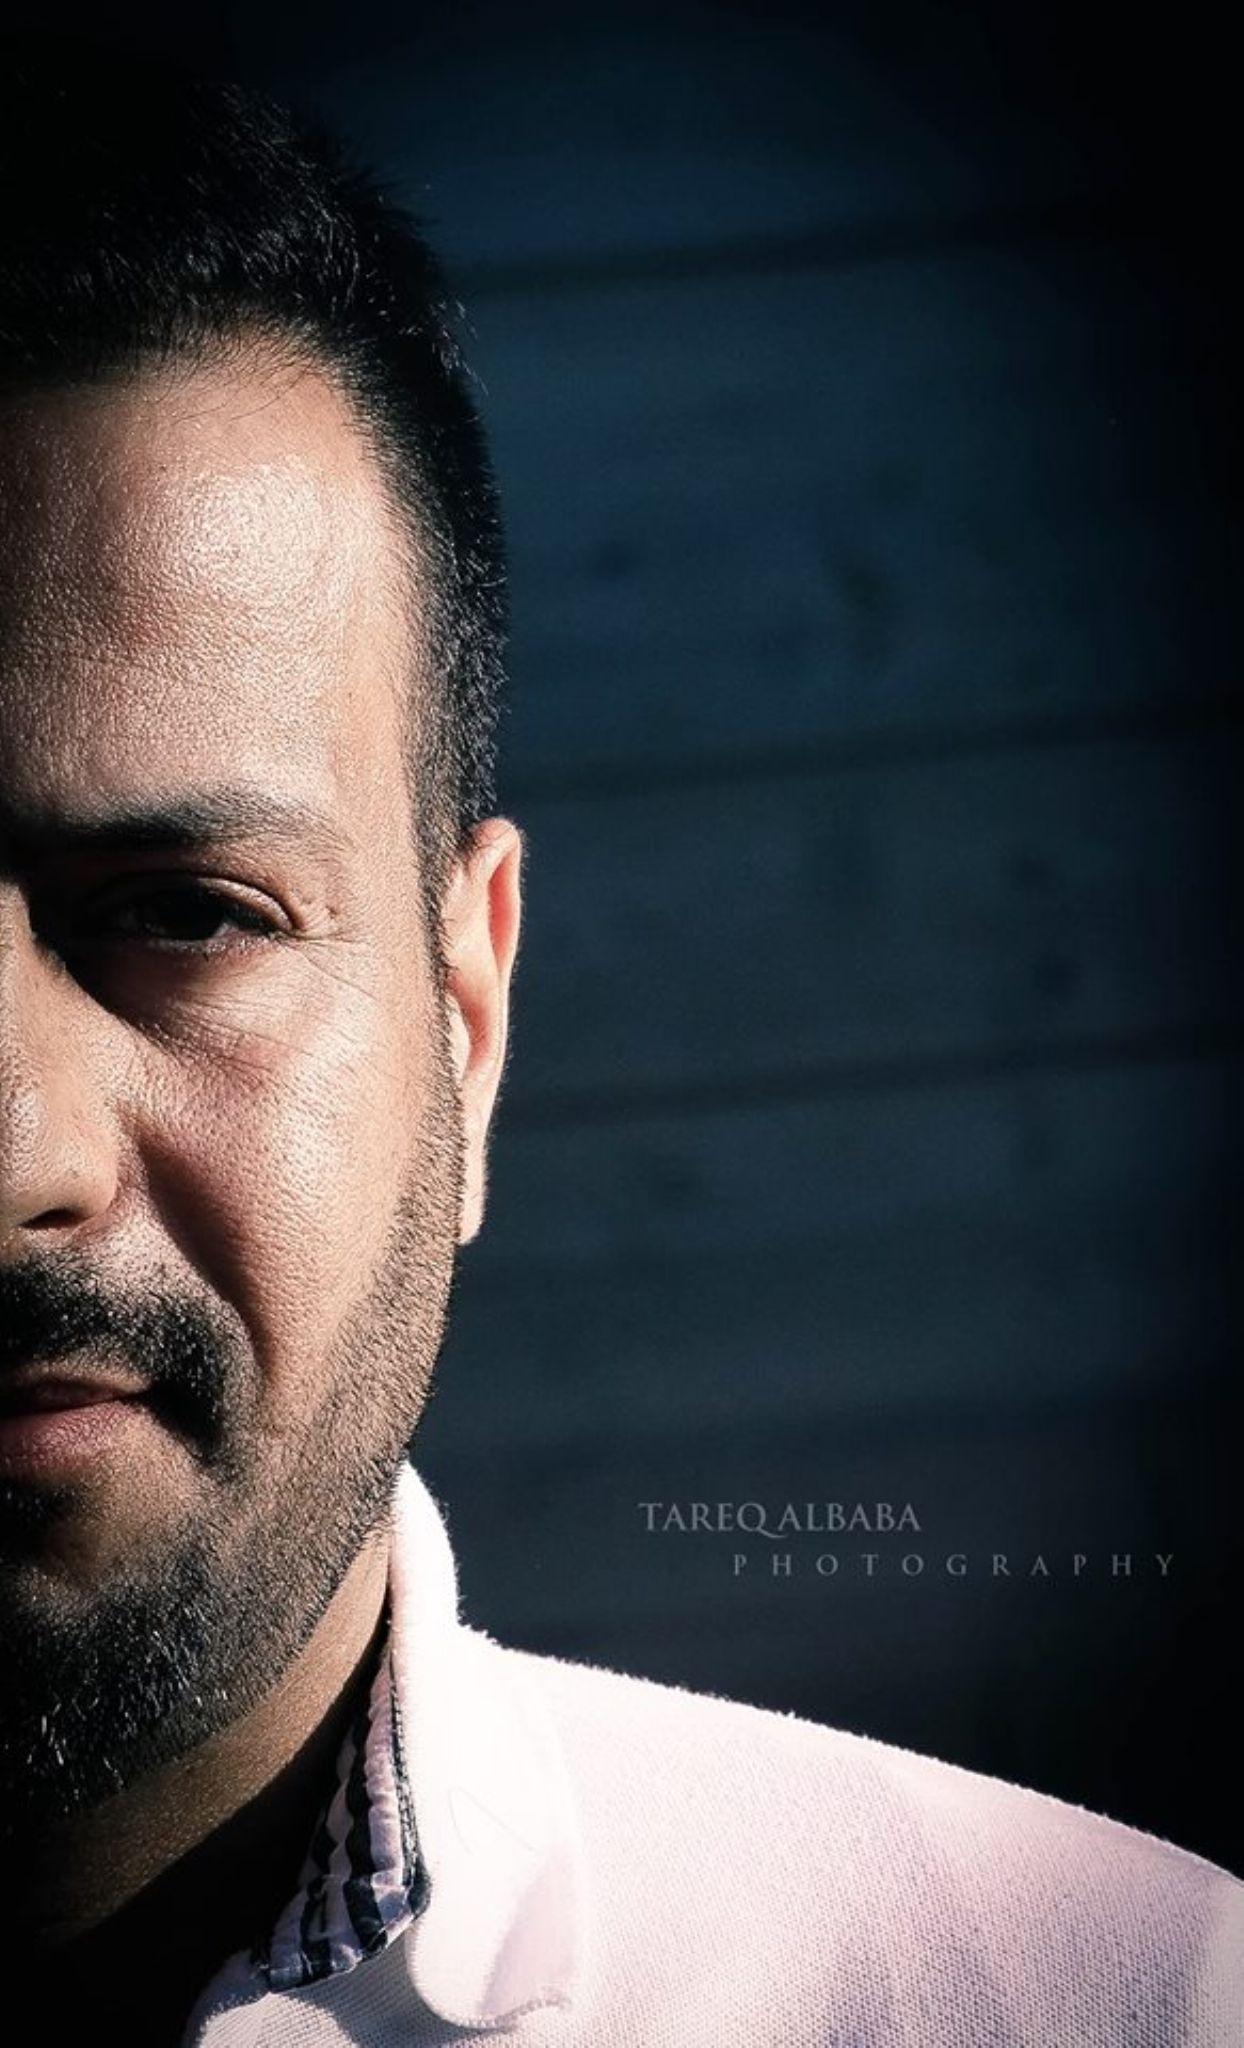 Qutyba by Tareq Albaba